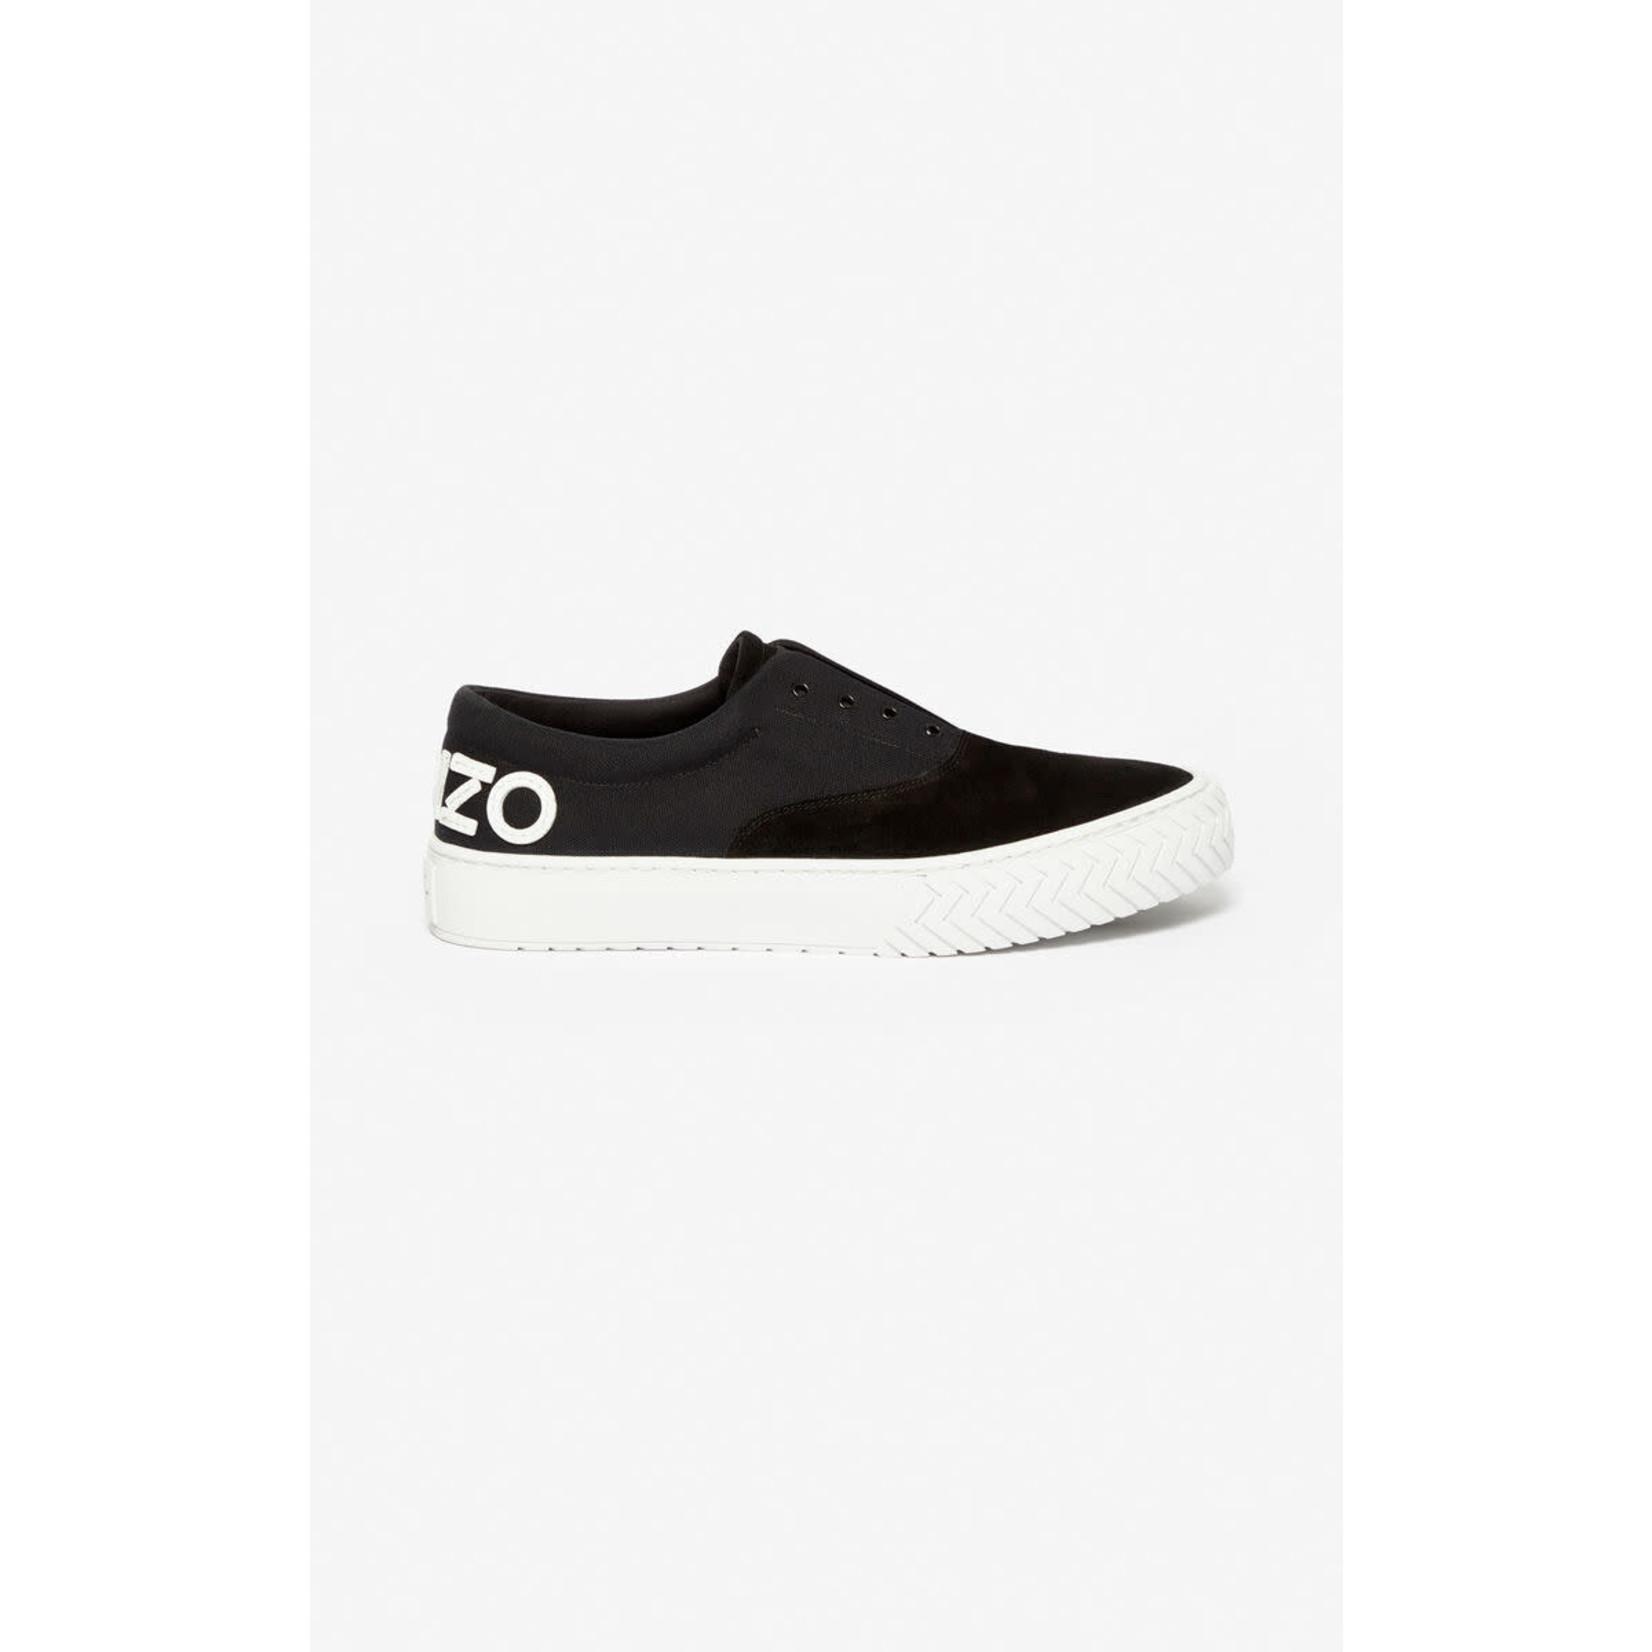 KENZO Kenzo - Unisex K-Skate Lace Up Sneakers